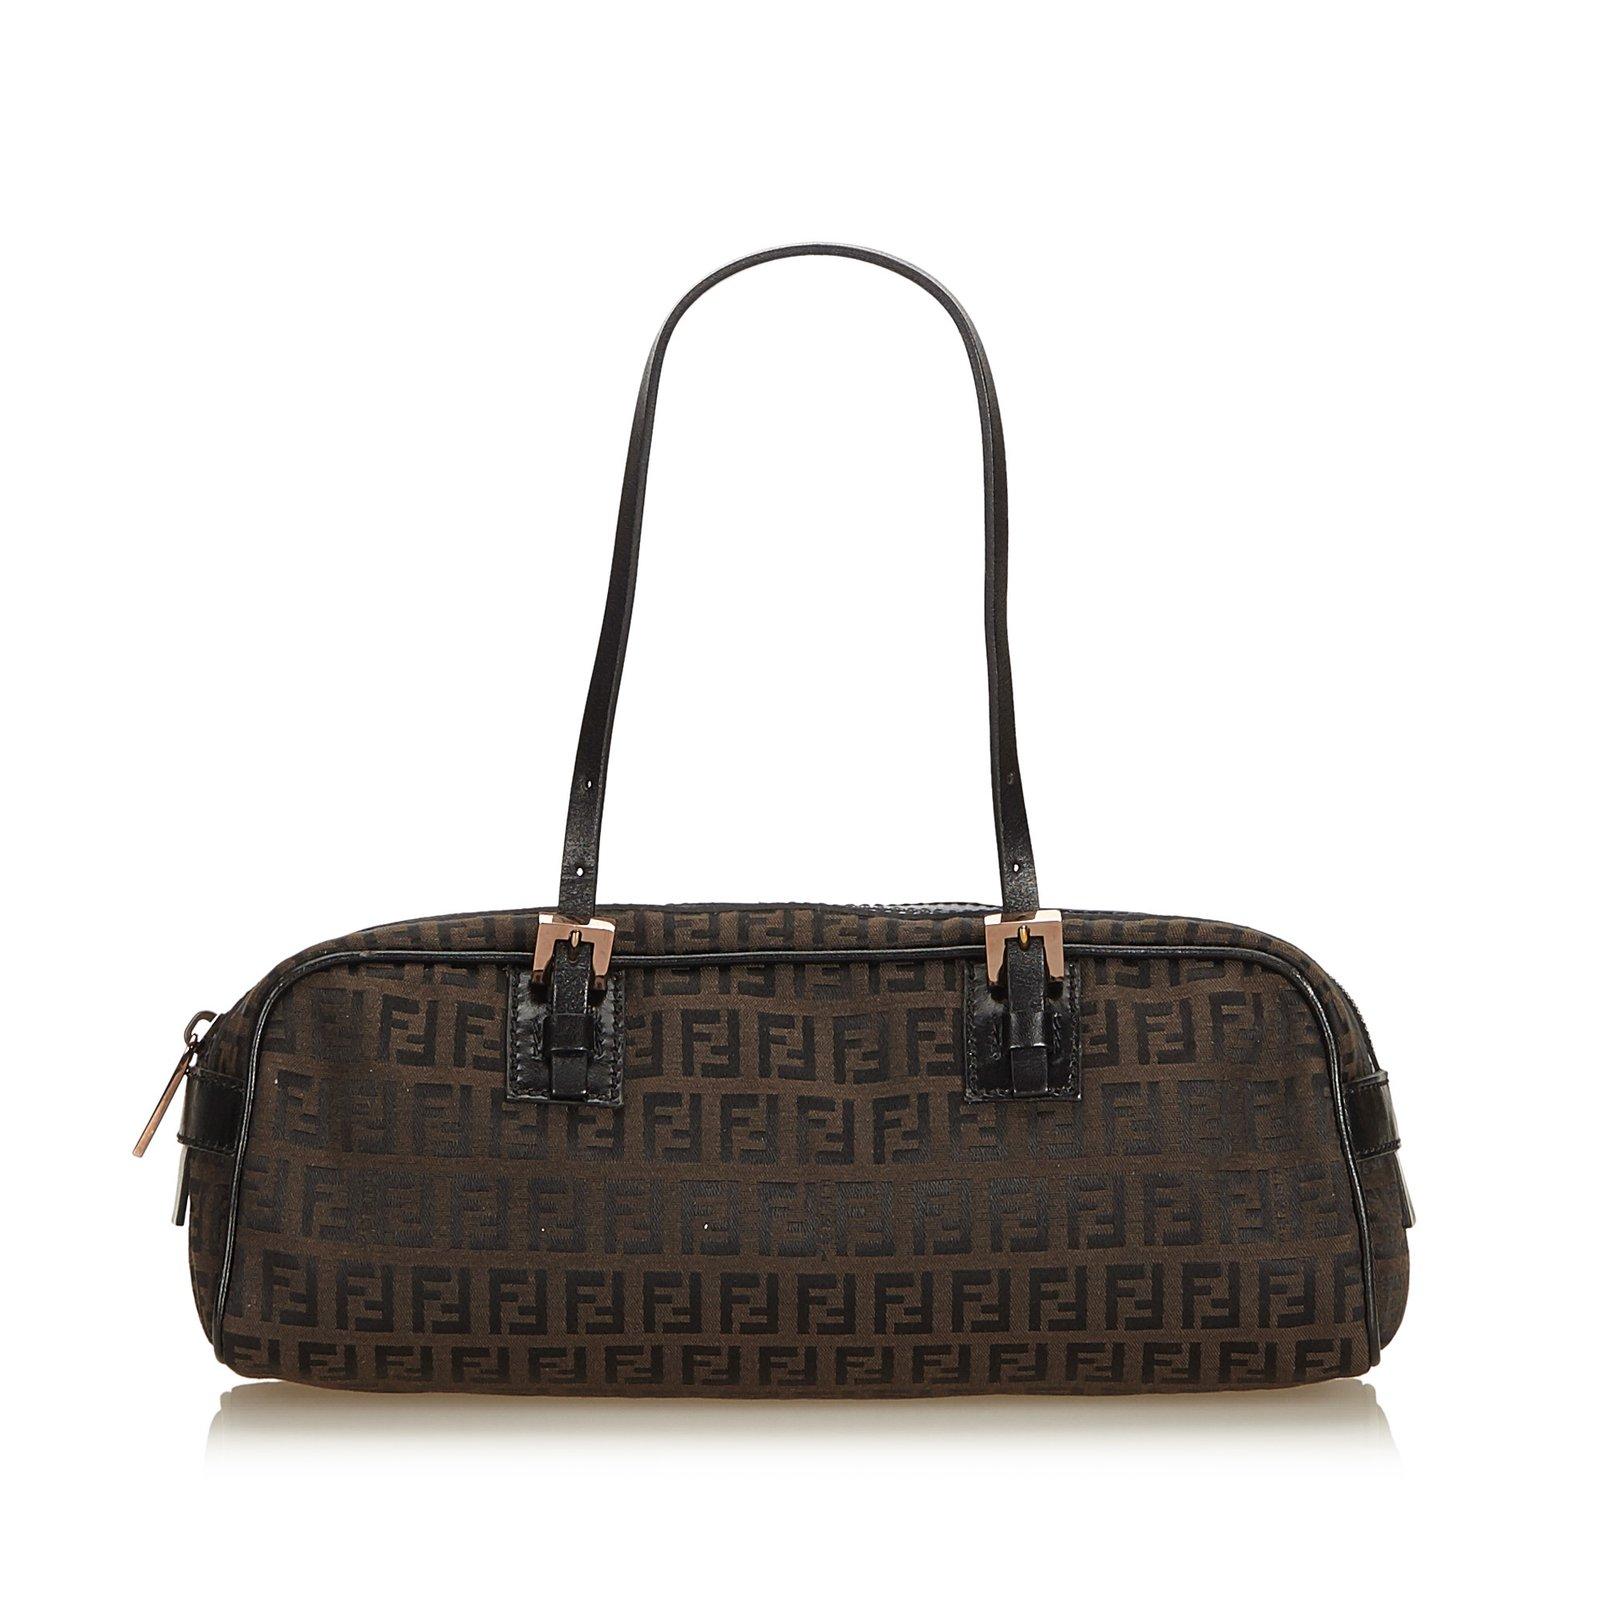 5f78583e43 Zucchino Jacquard Shoulder Bag